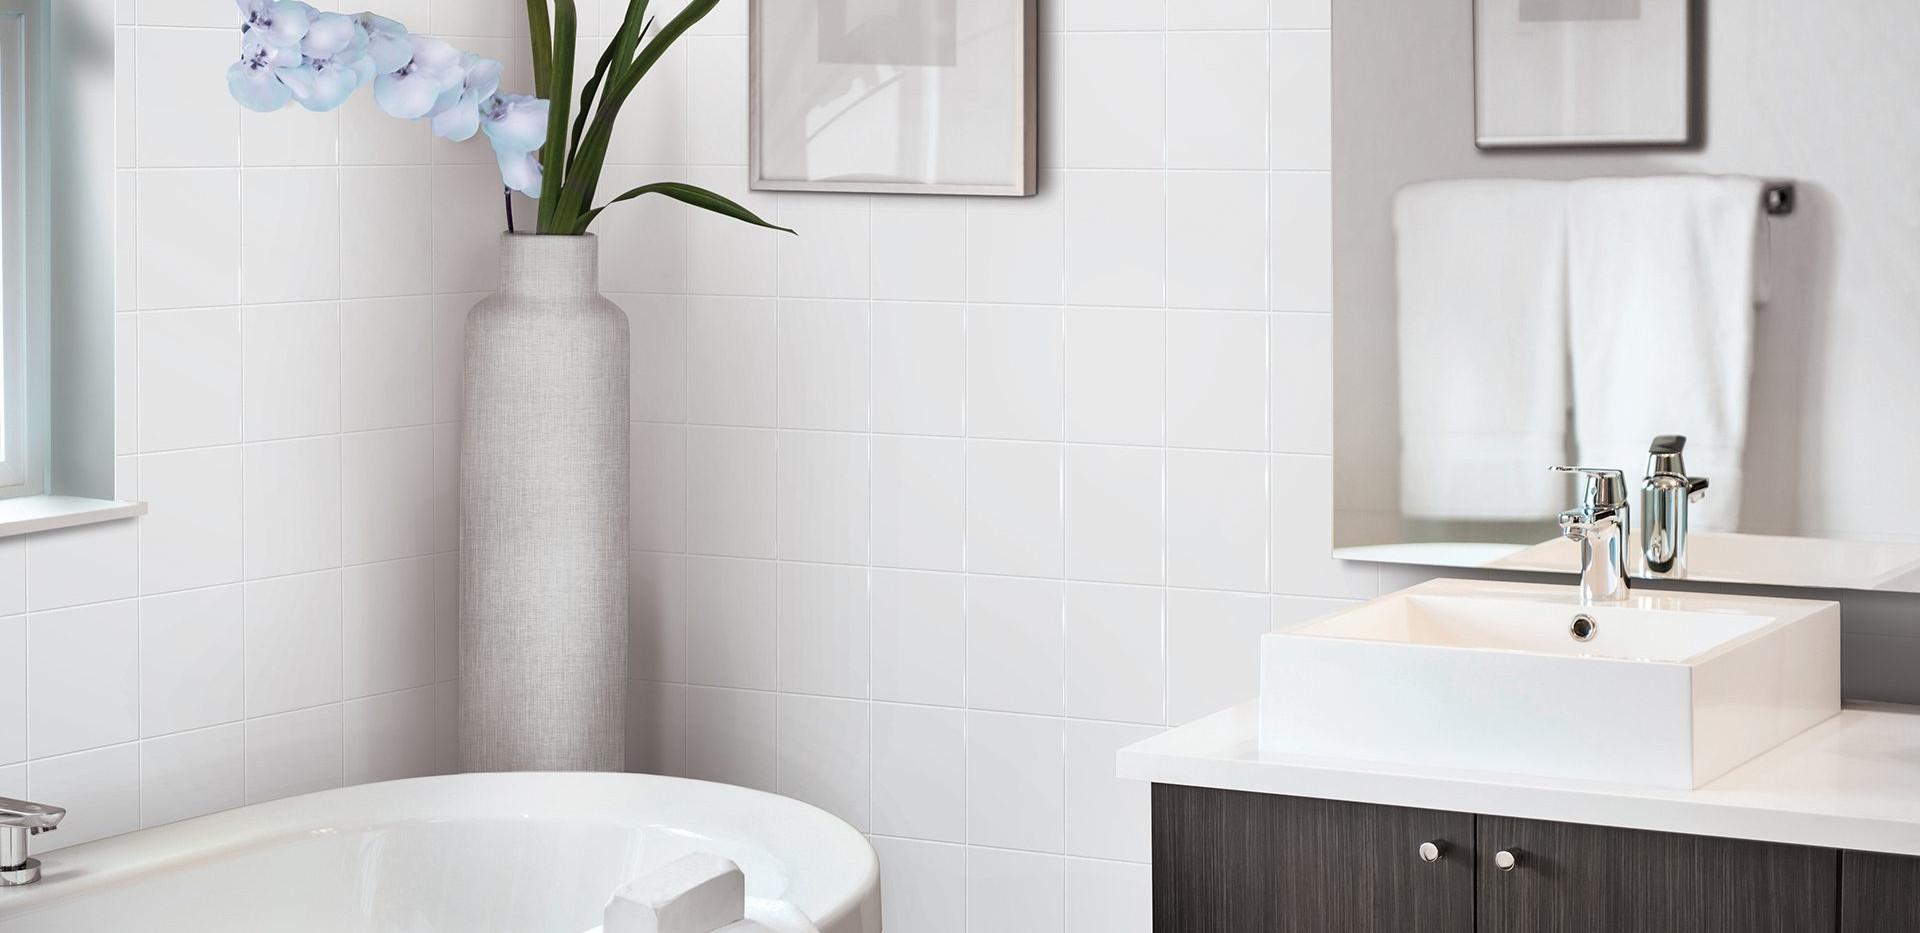 51-500_6x6_Soho-White-Glossy-Wall-Tile_l